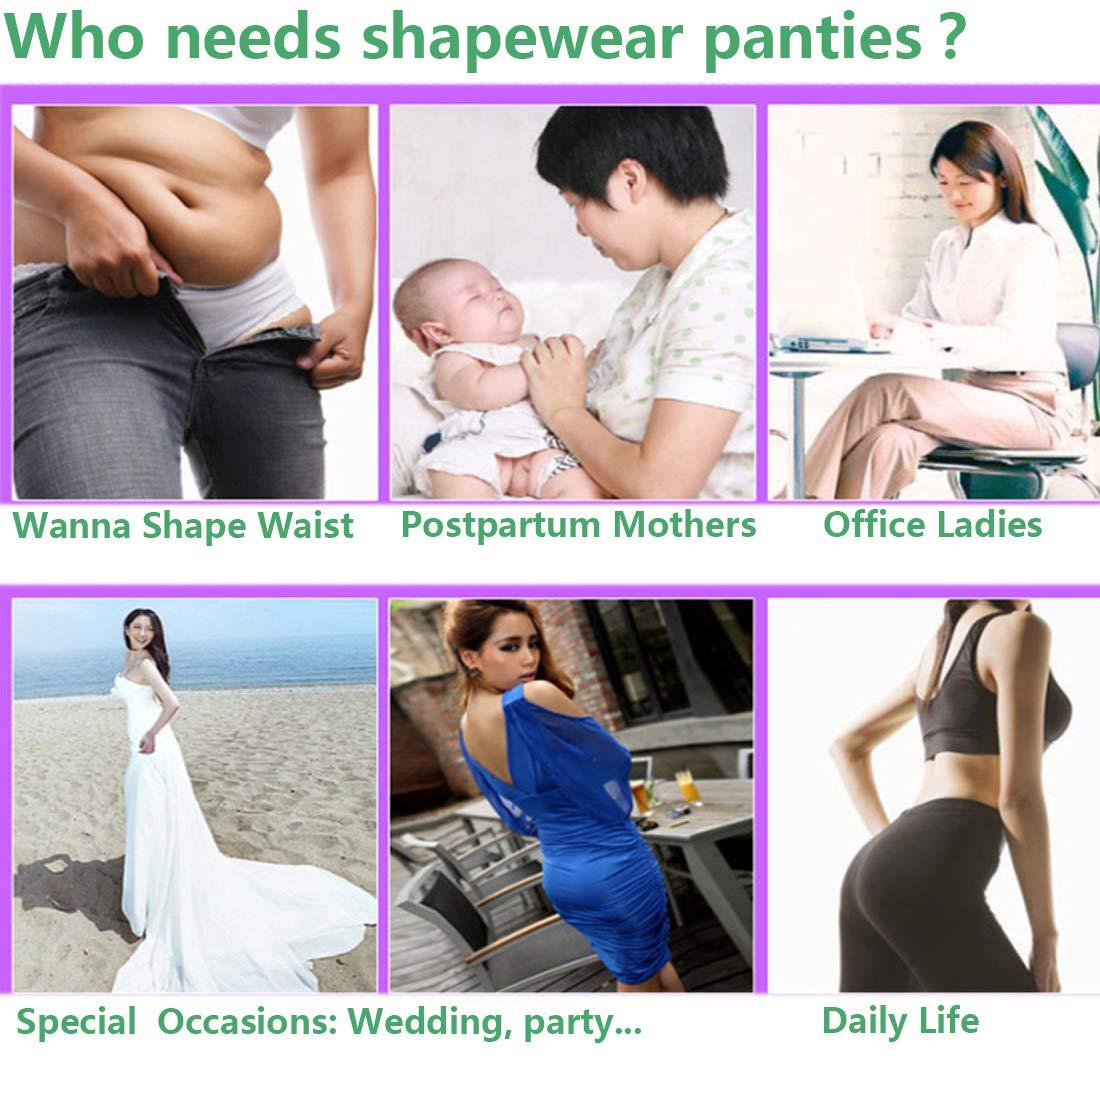 High Waist Slip Shorts for Under Dresses Thigh Slimmer Shapewear Shorts Tummy Control Body Shaper Women